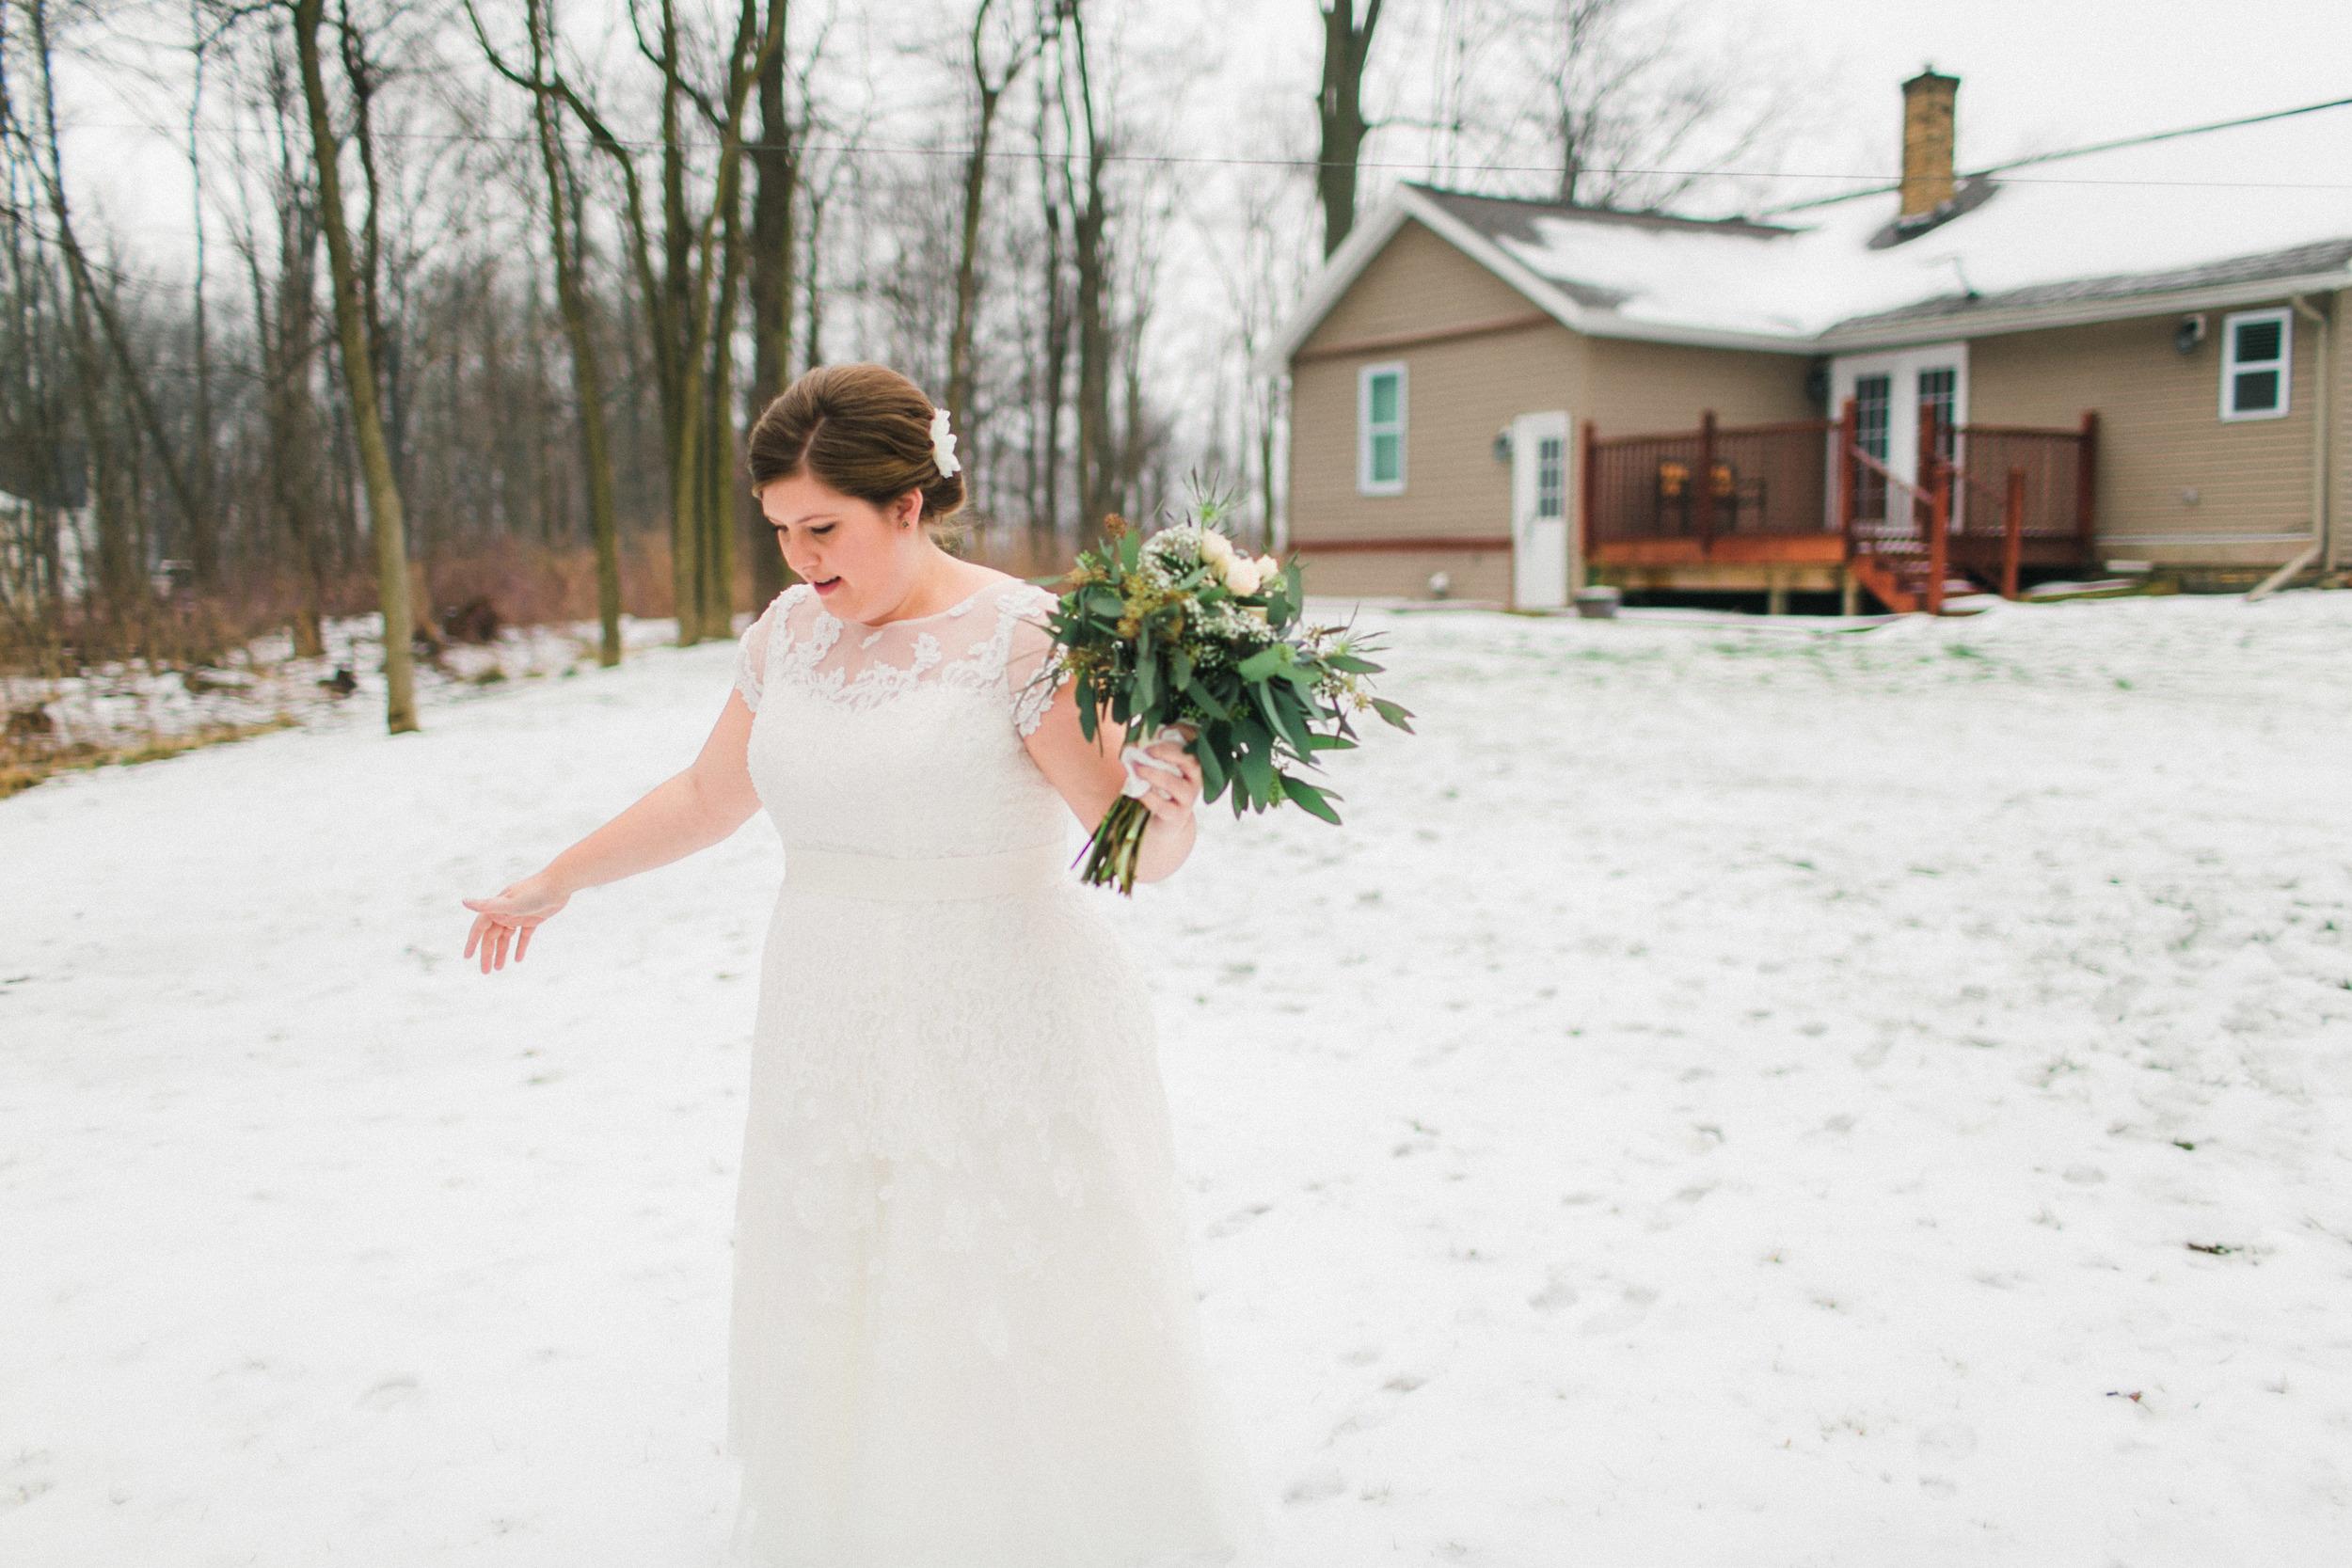 mayden photography_bridal portraits-13.jpg